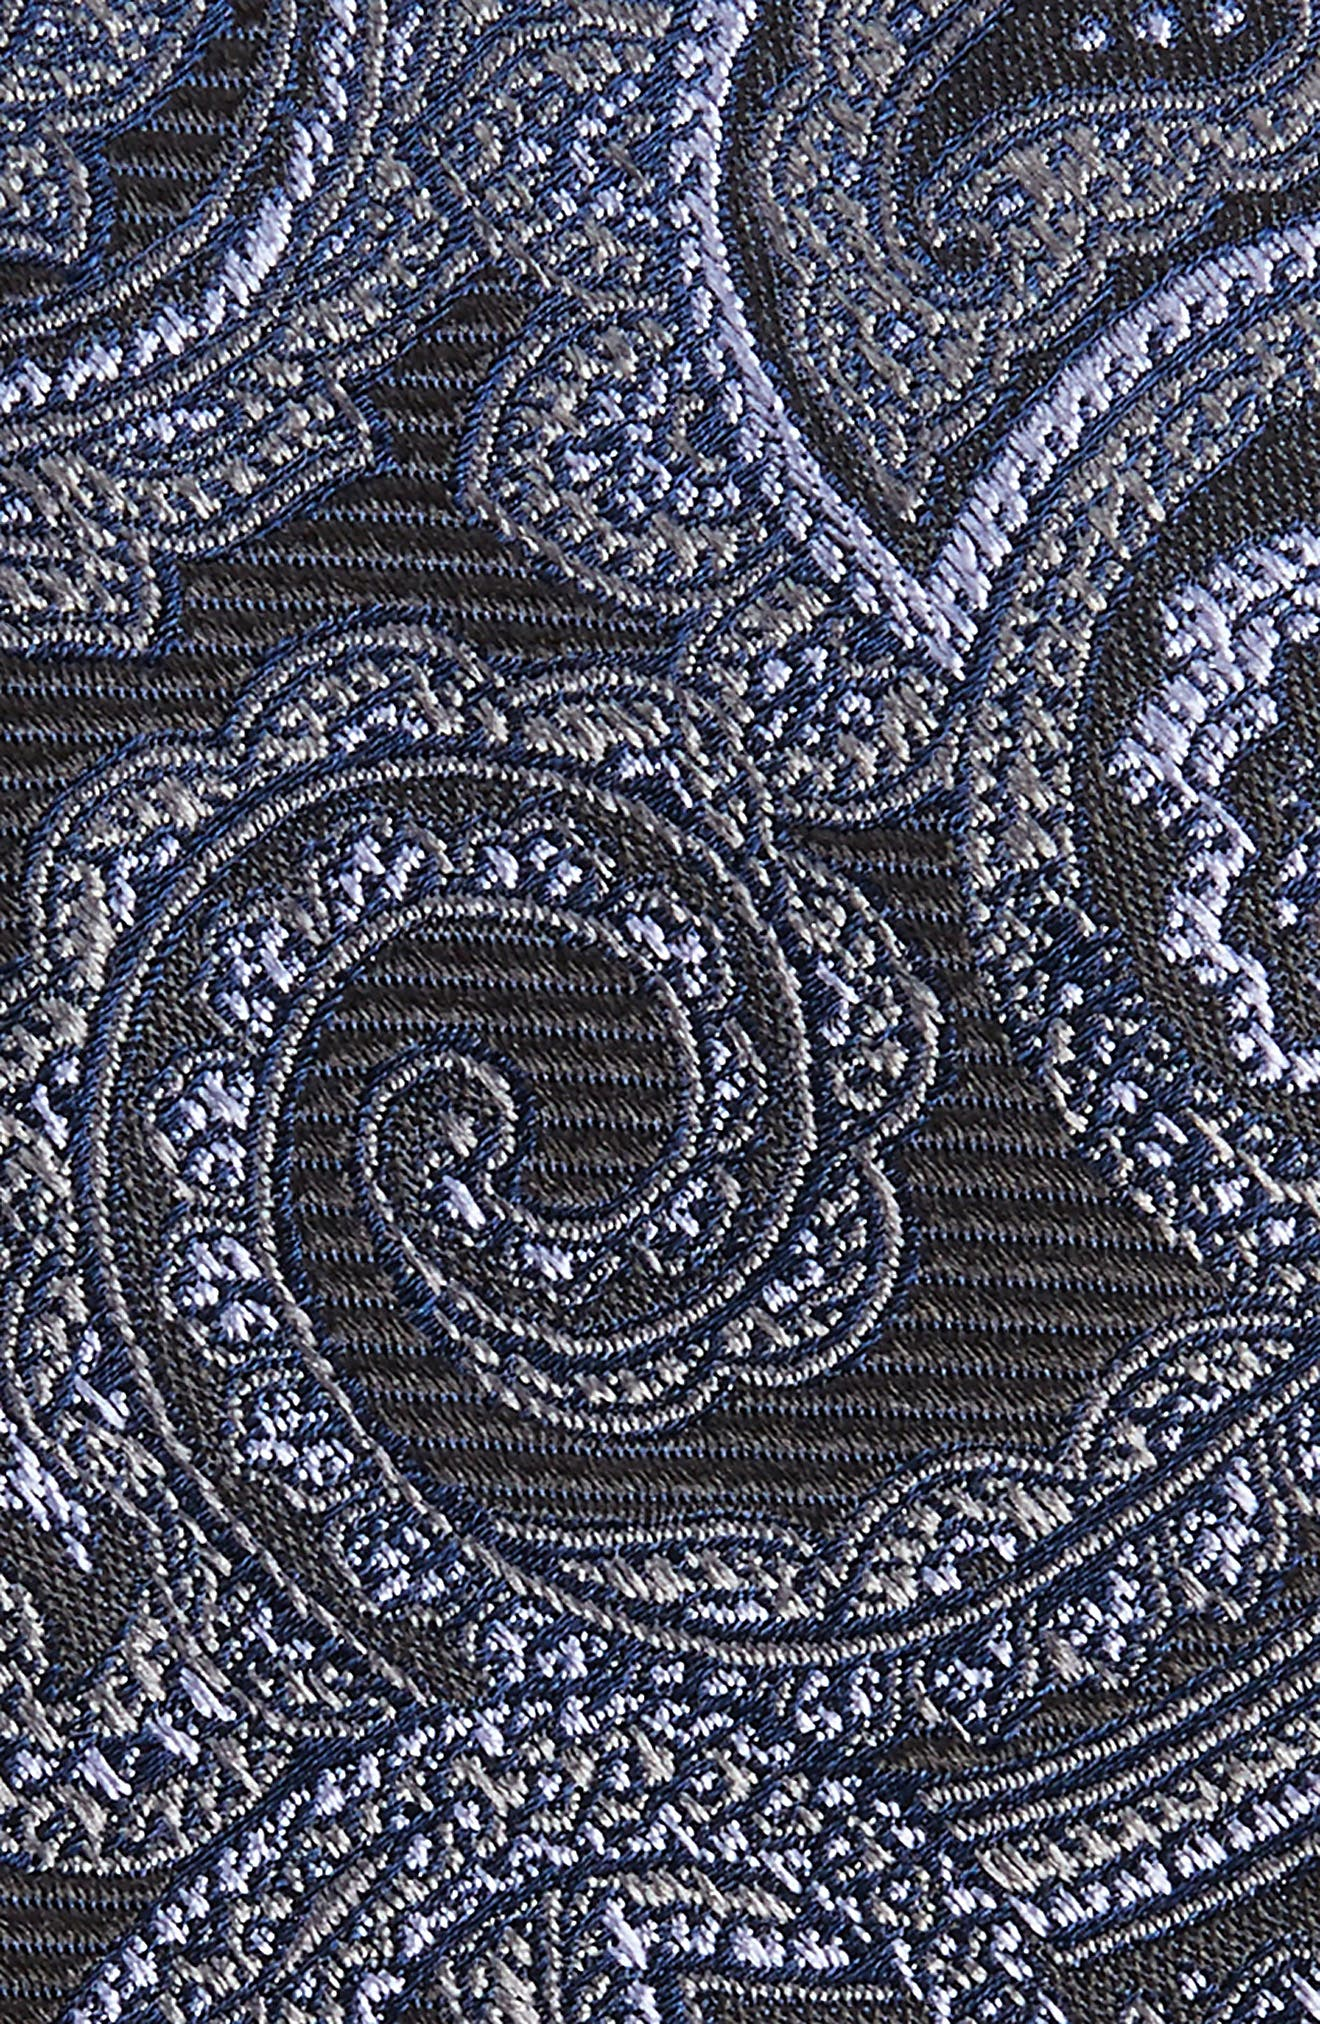 Avalon Paisley Silk Tie,                             Alternate thumbnail 2, color,                             001